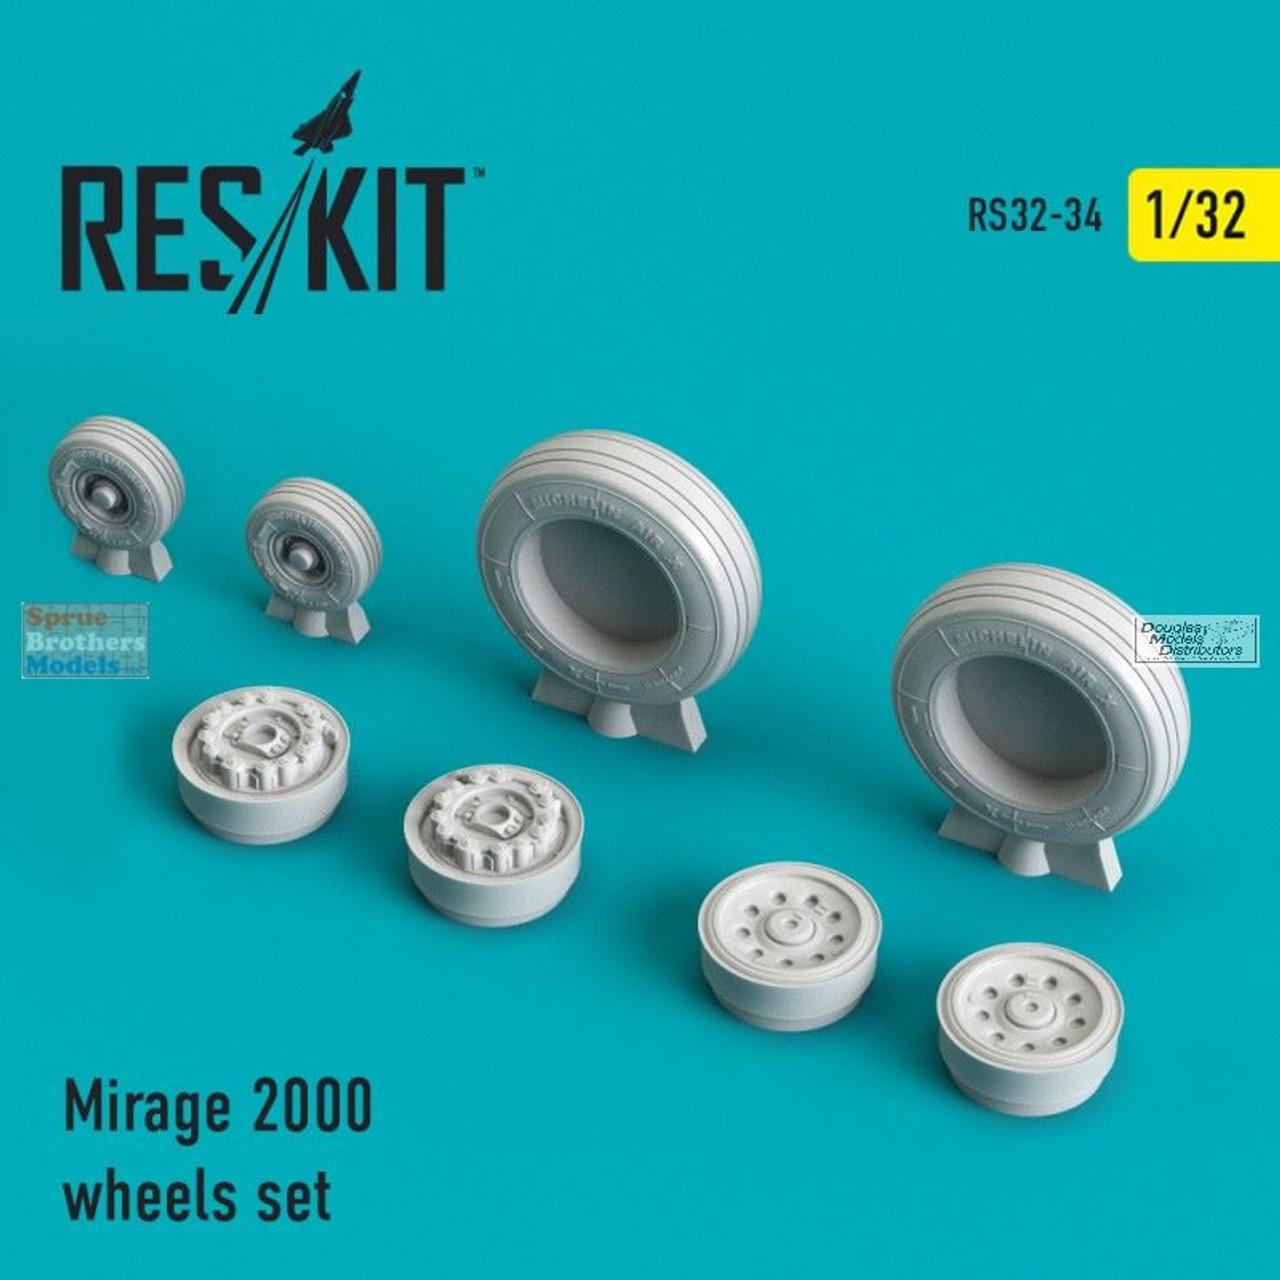 RESRS320034 1:32 ResKit Mirage 2000 Wheels Set